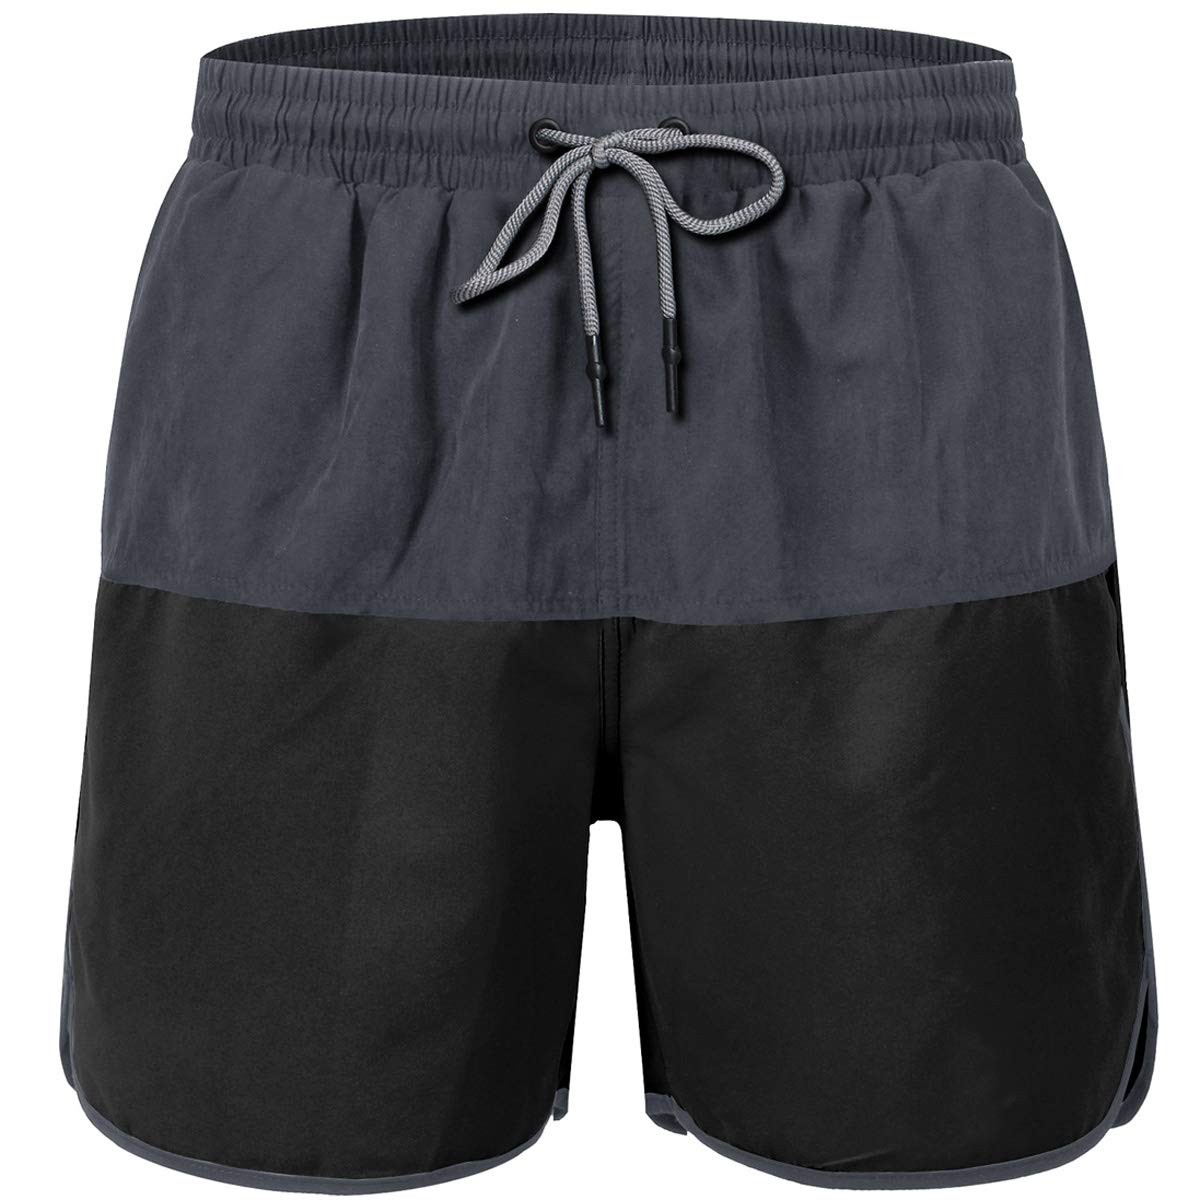 JINSHI Men/'s Beach Shorts Swim Trunks Mesh Lining Quick Dry Elastic Beachwear